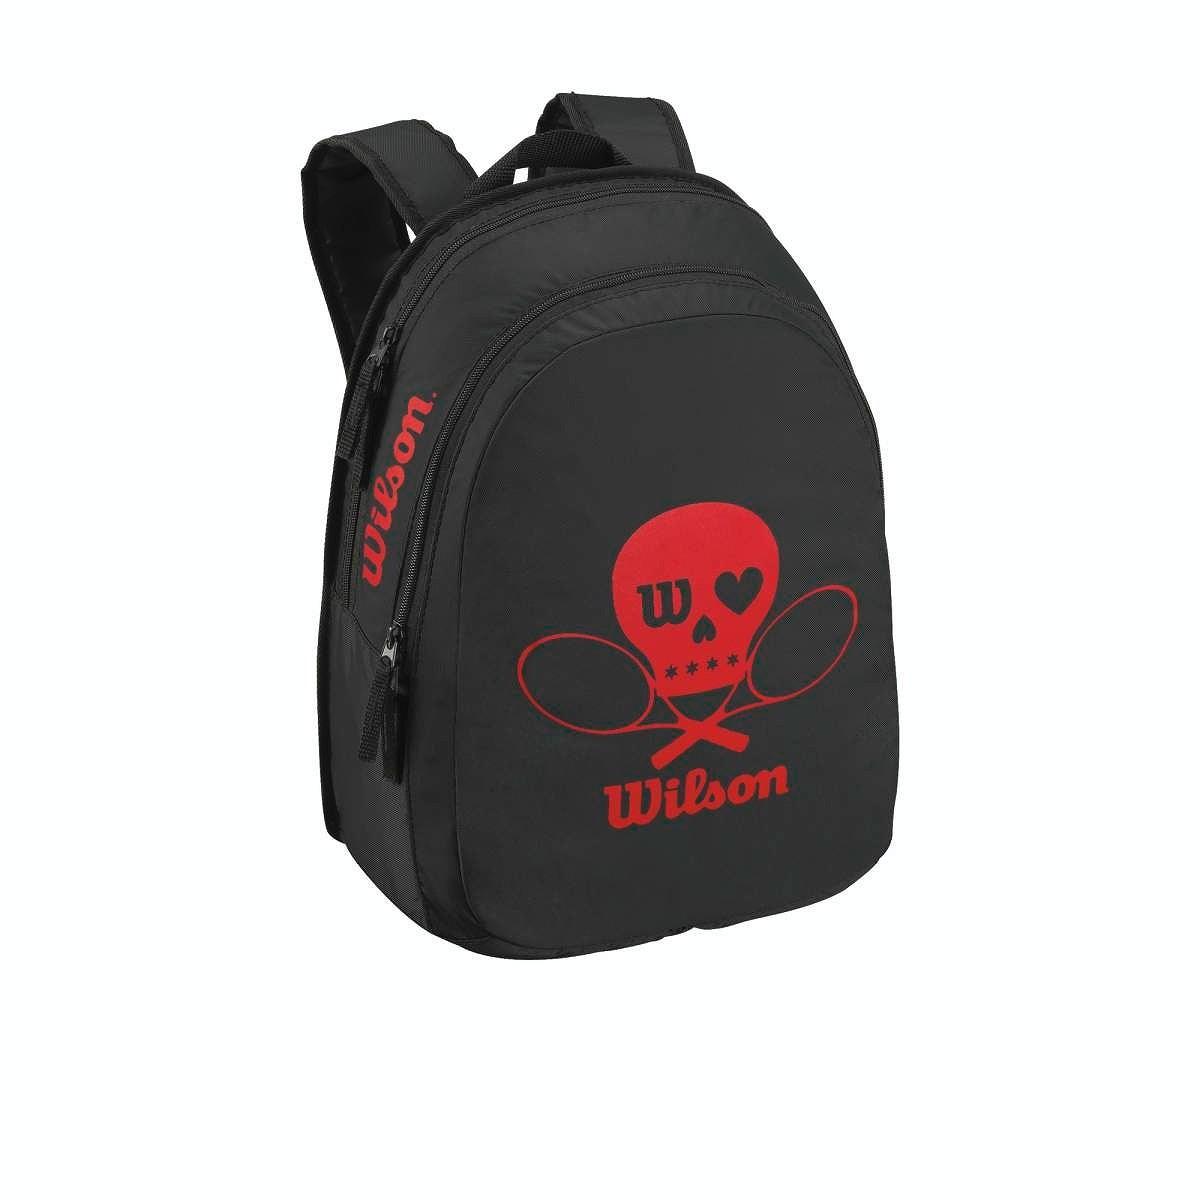 Plecak tenisowy Wilson Match Junior Black